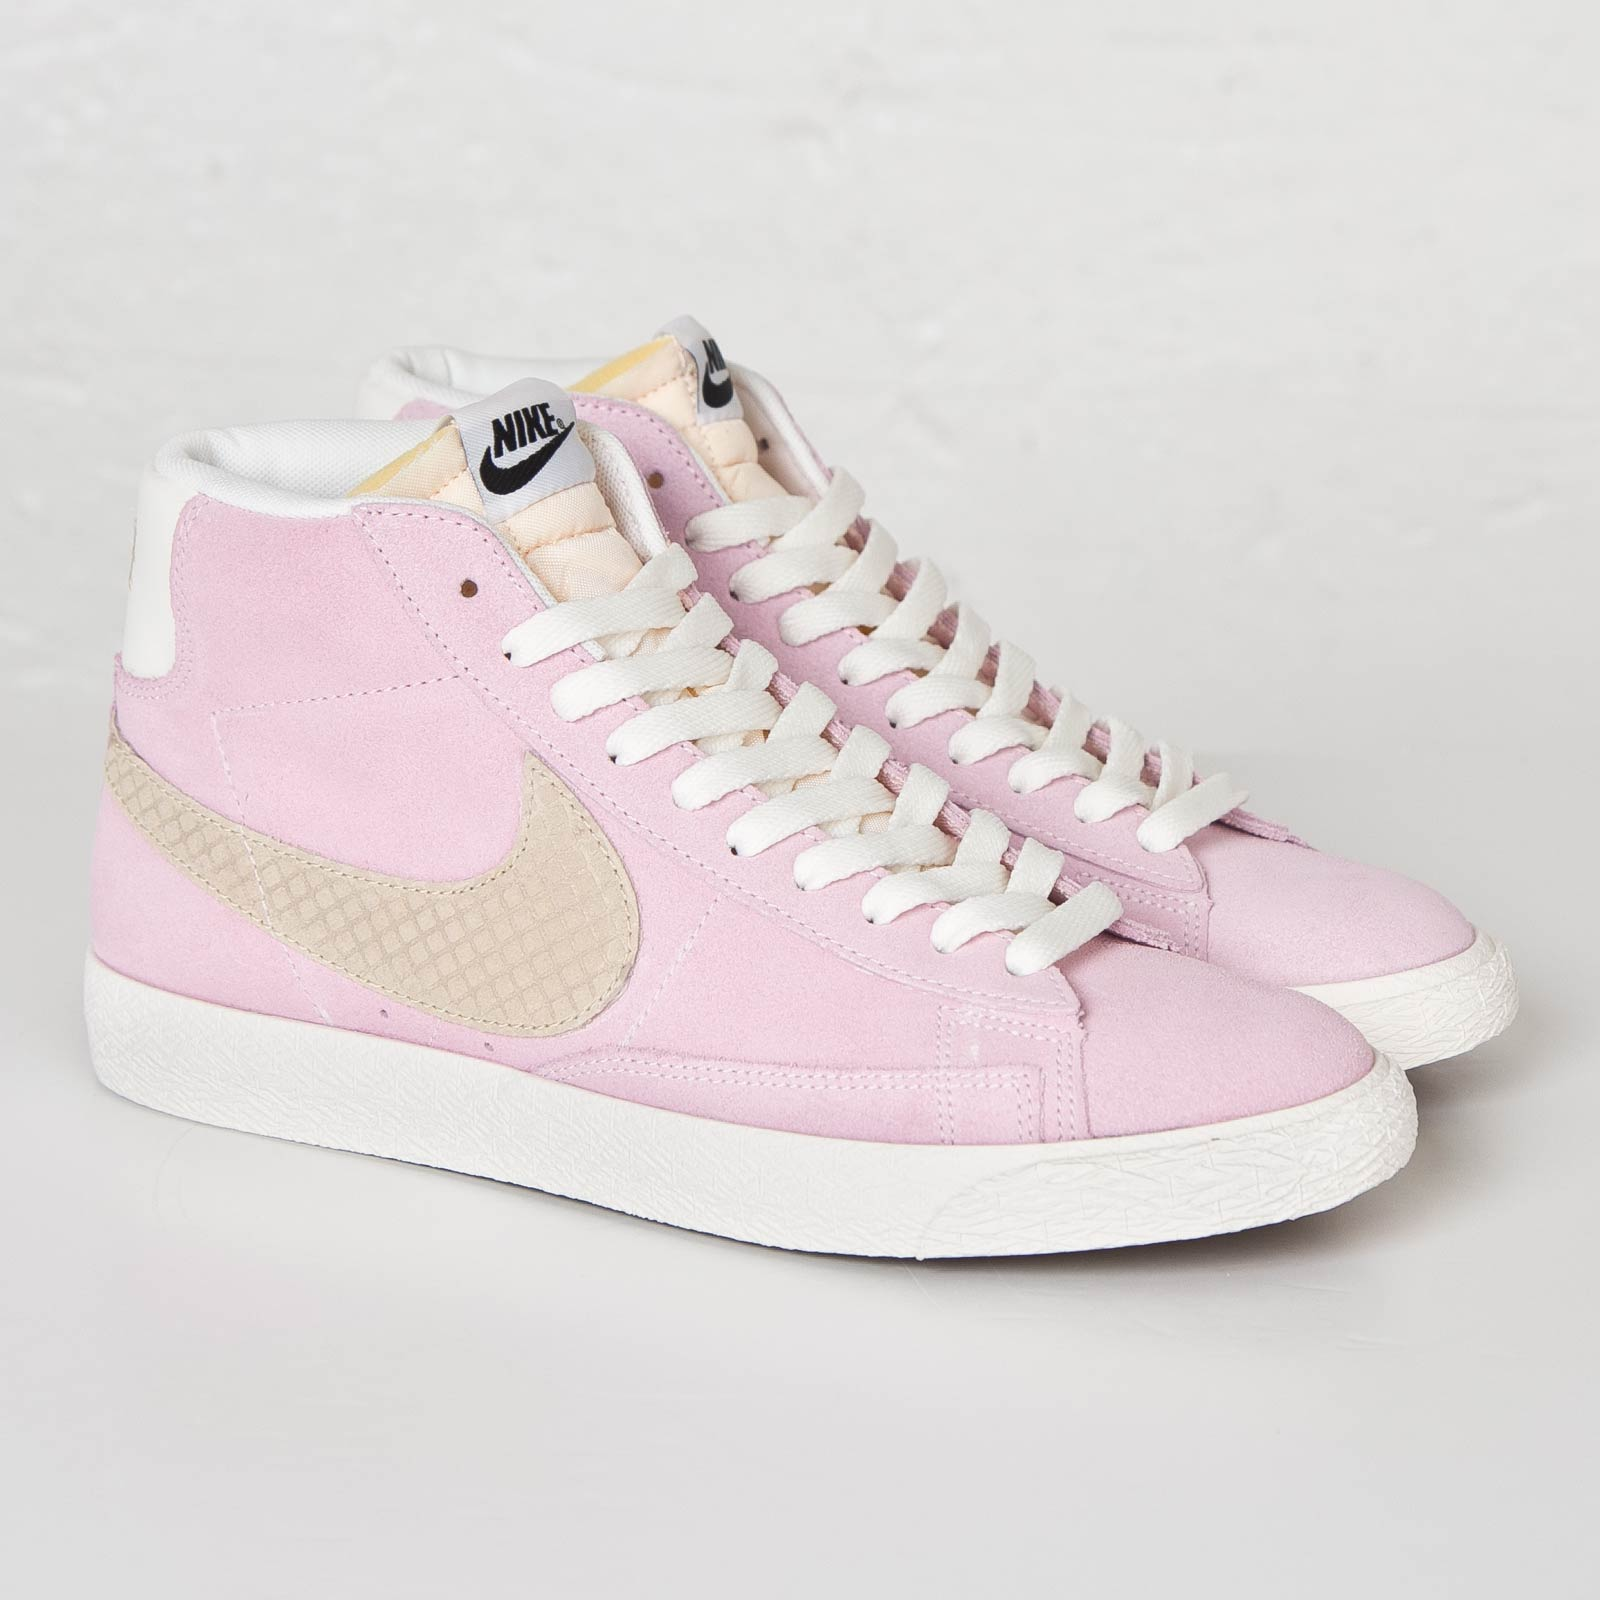 Nike Blazer Mid Mid Mid Premium Vintage Qs 638322 601 Chaussuressnstuff 022e5d